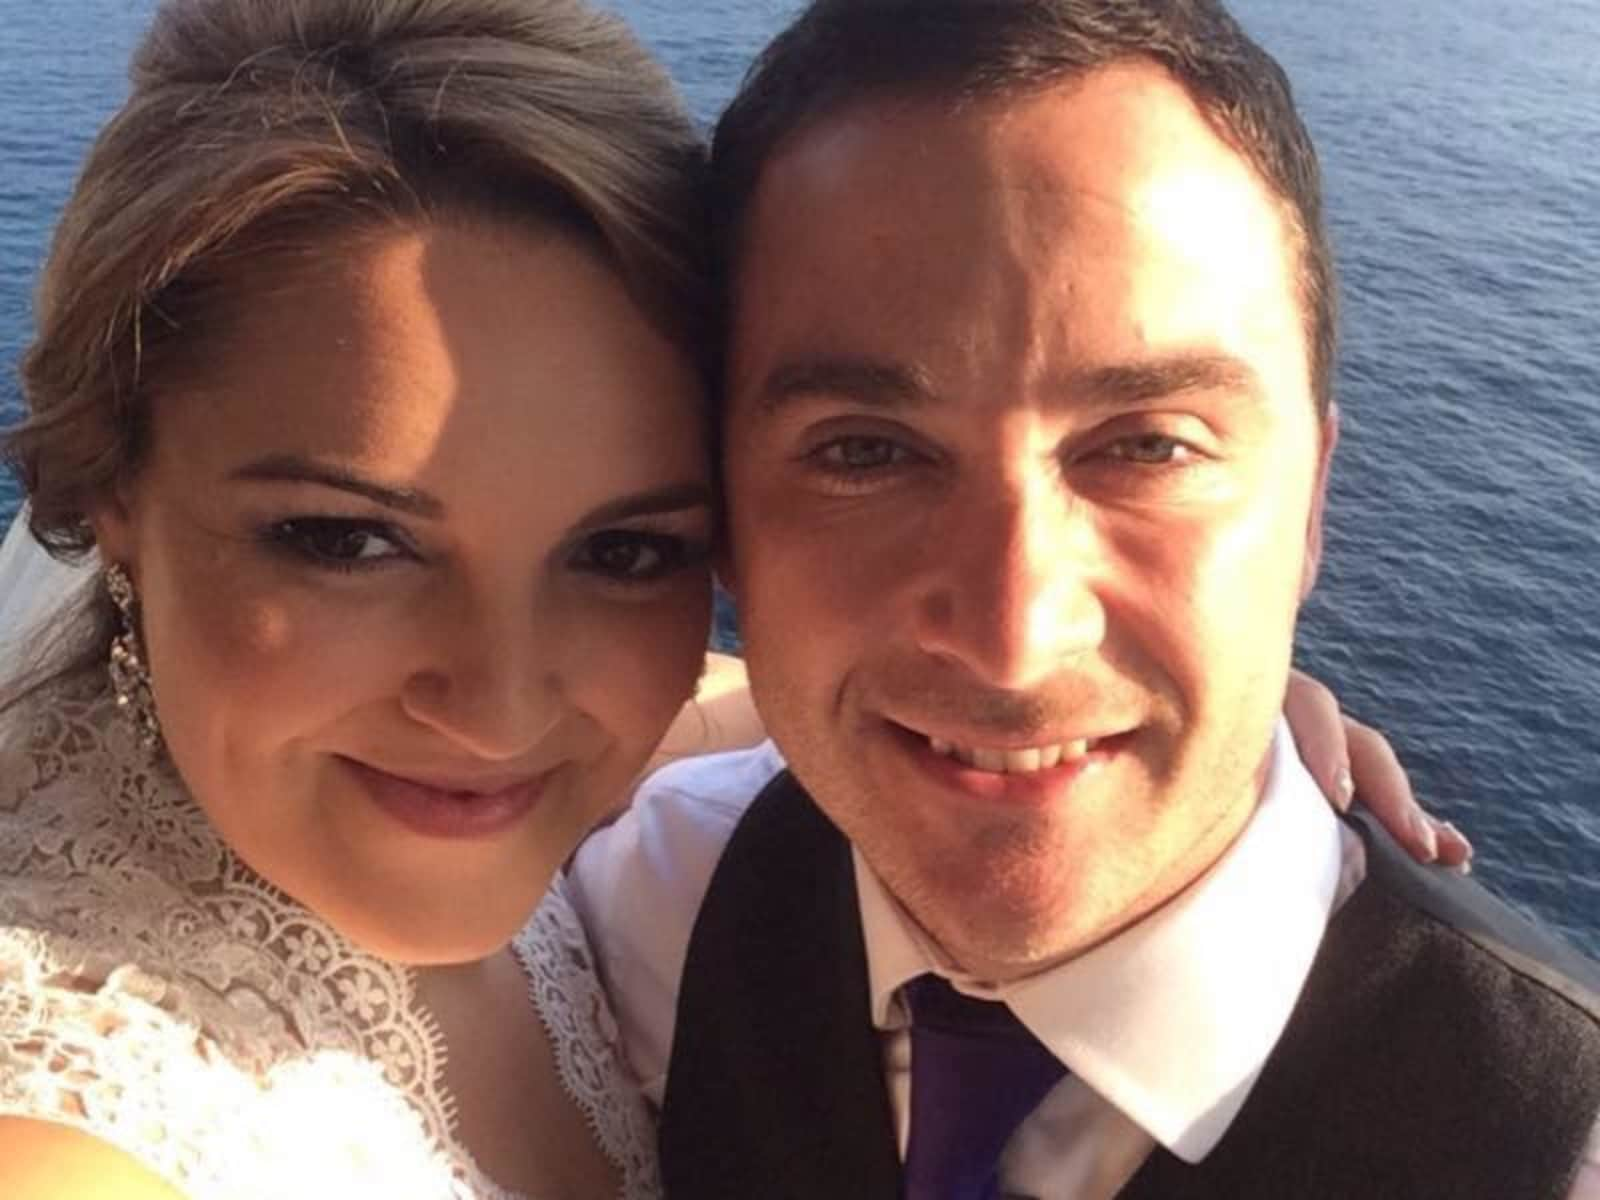 Frances & Jason from Perth, Western Australia, Australia